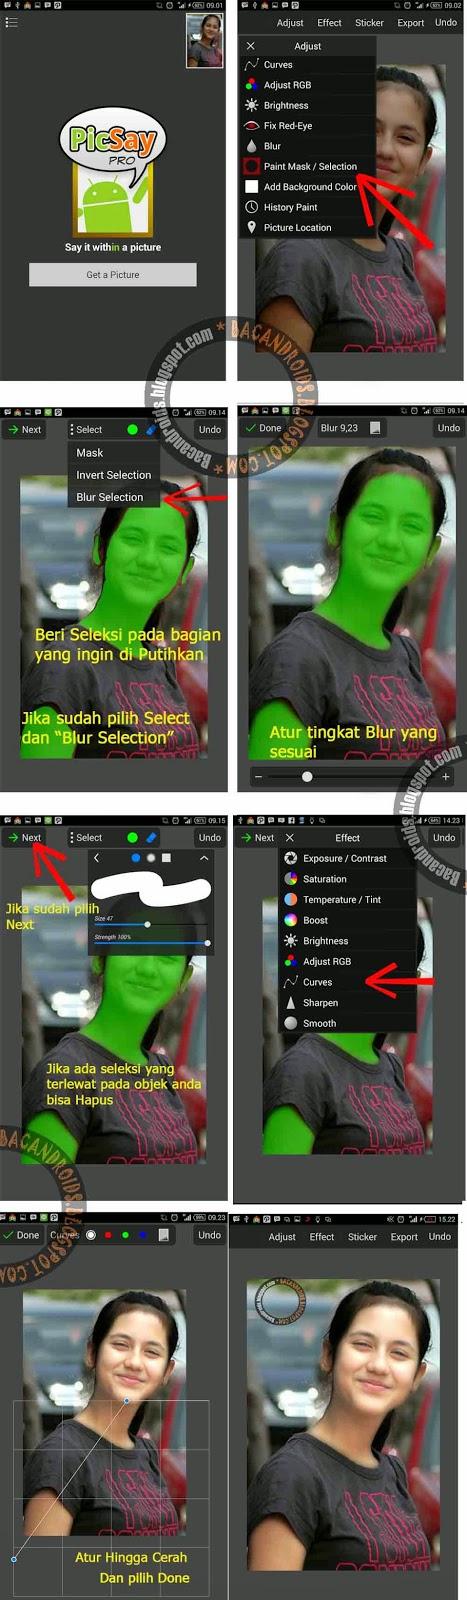 Penggunaan picsay Pro Cara Edit Foto Memutihkan Kulit